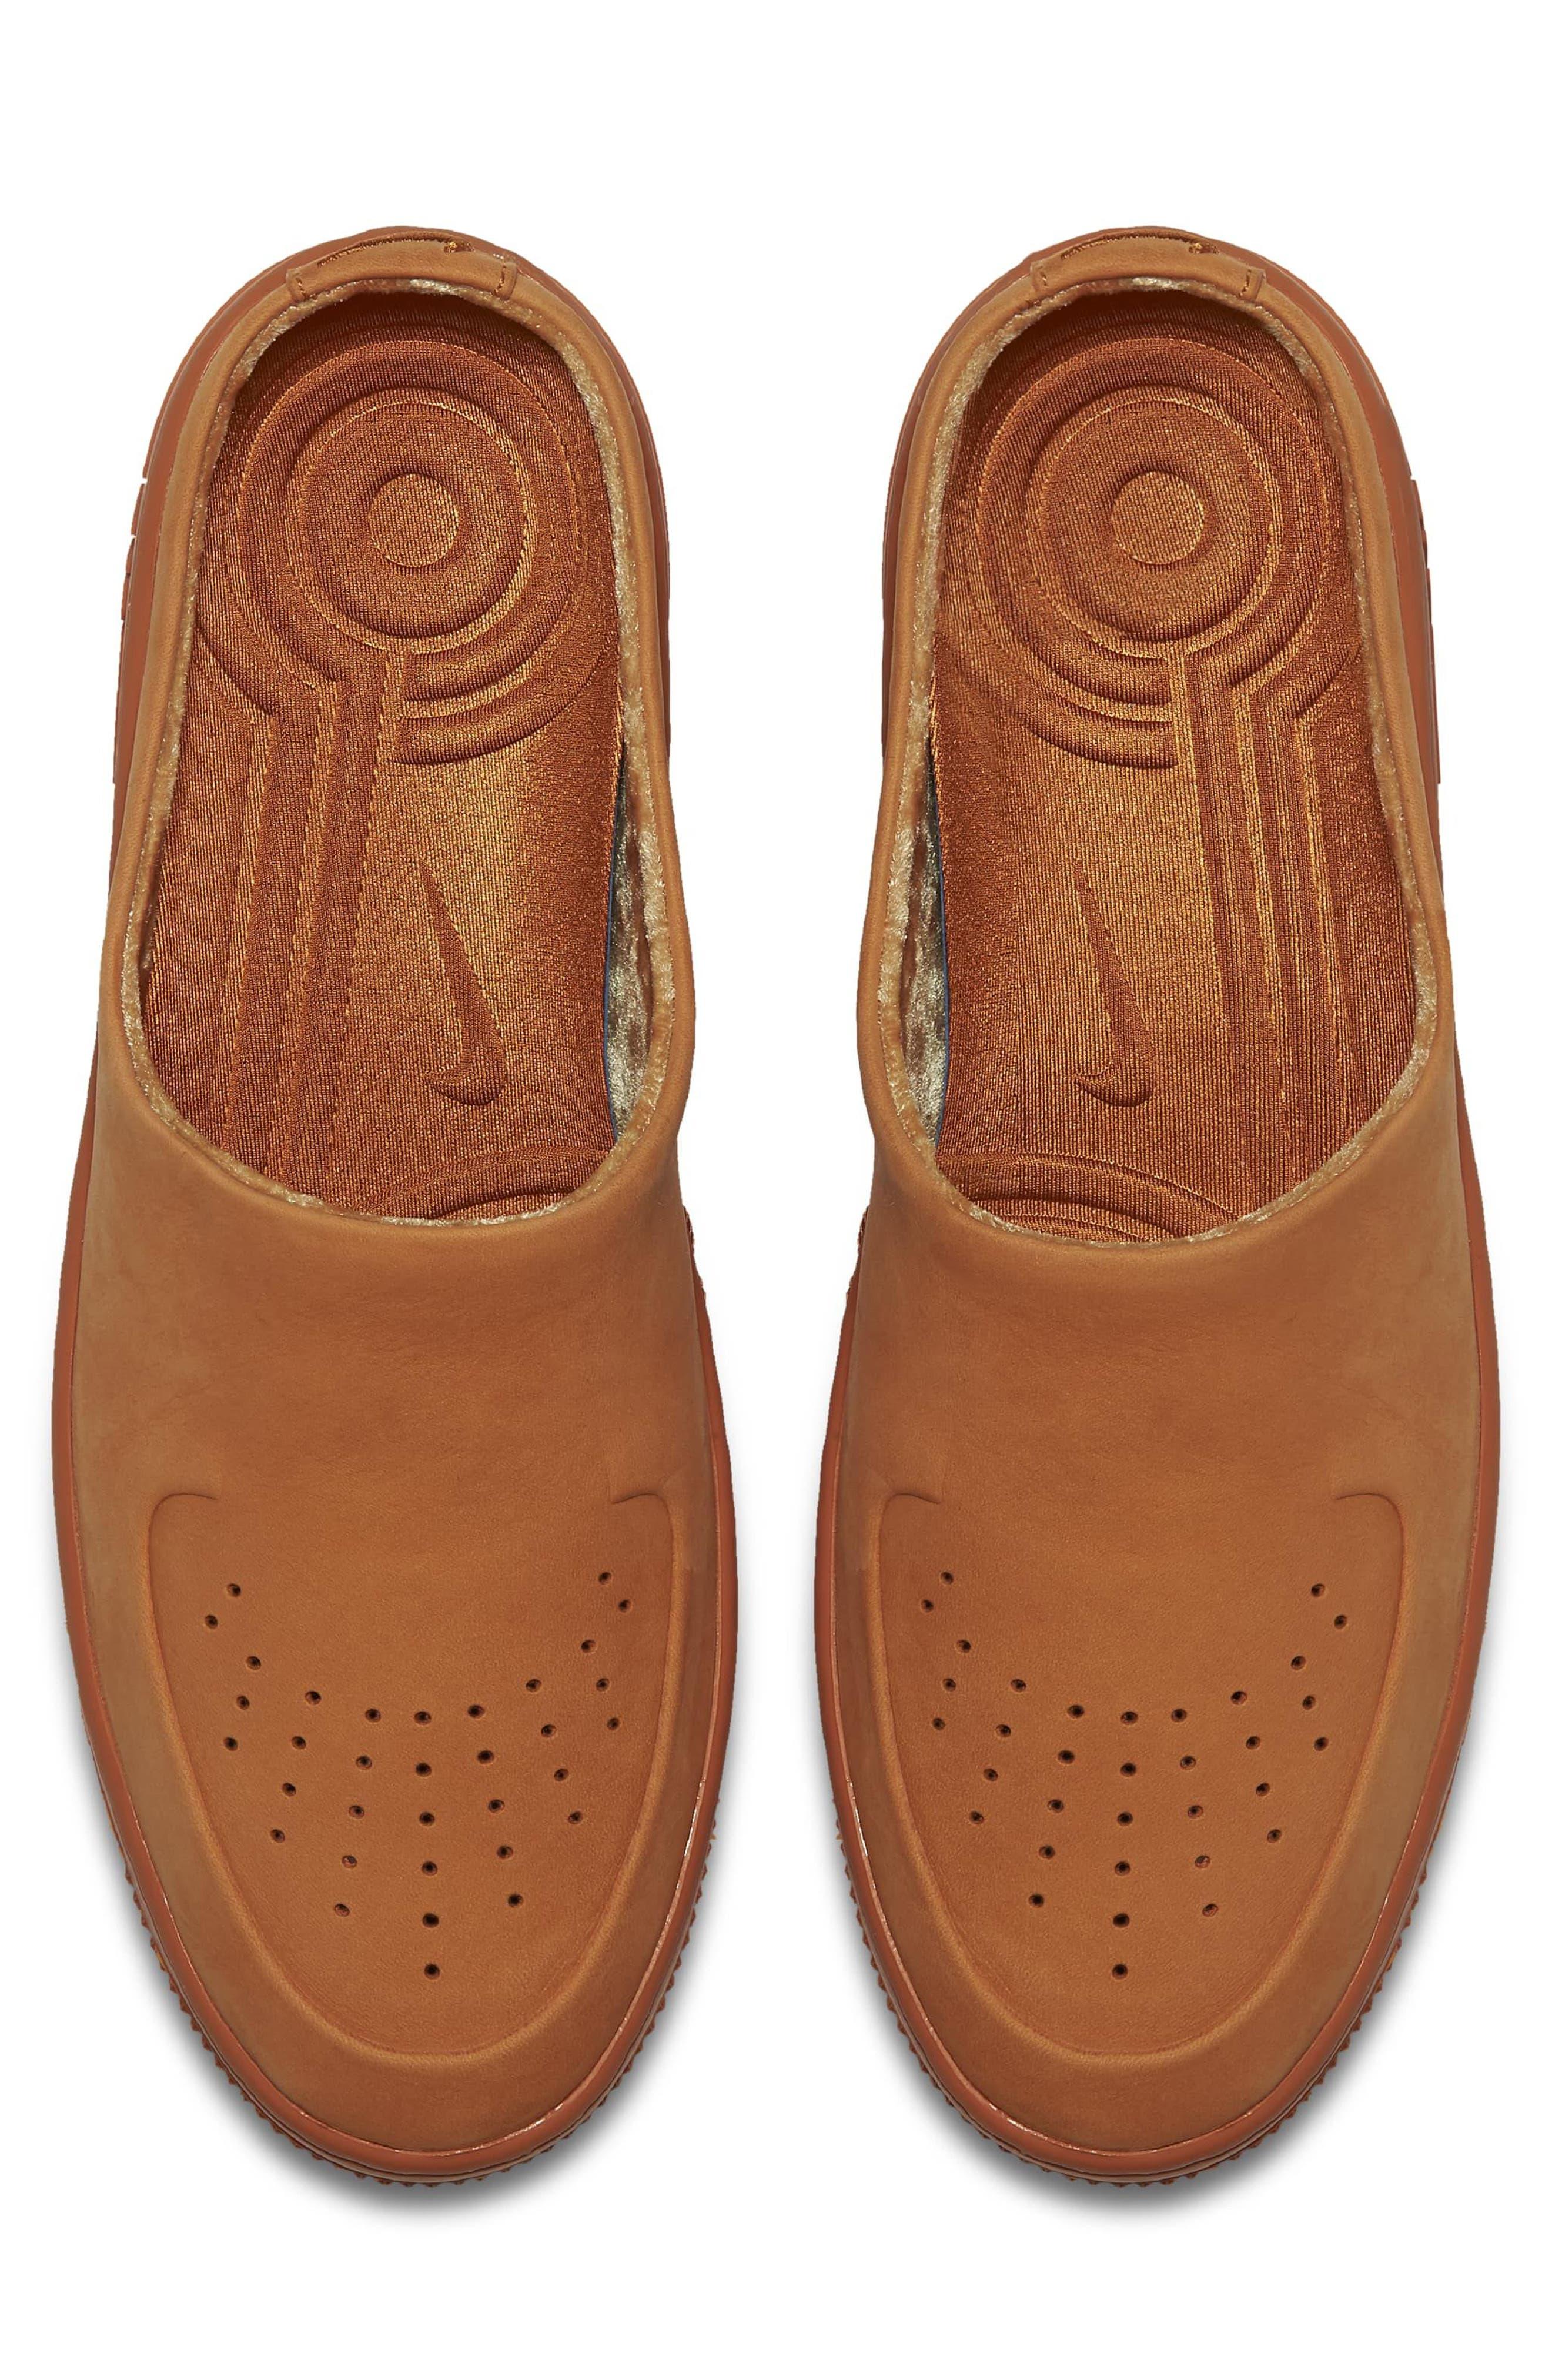 Air Force 1 Lover XX Slip-On Mule Sneaker,                             Alternate thumbnail 4, color,                             Cinder Orange